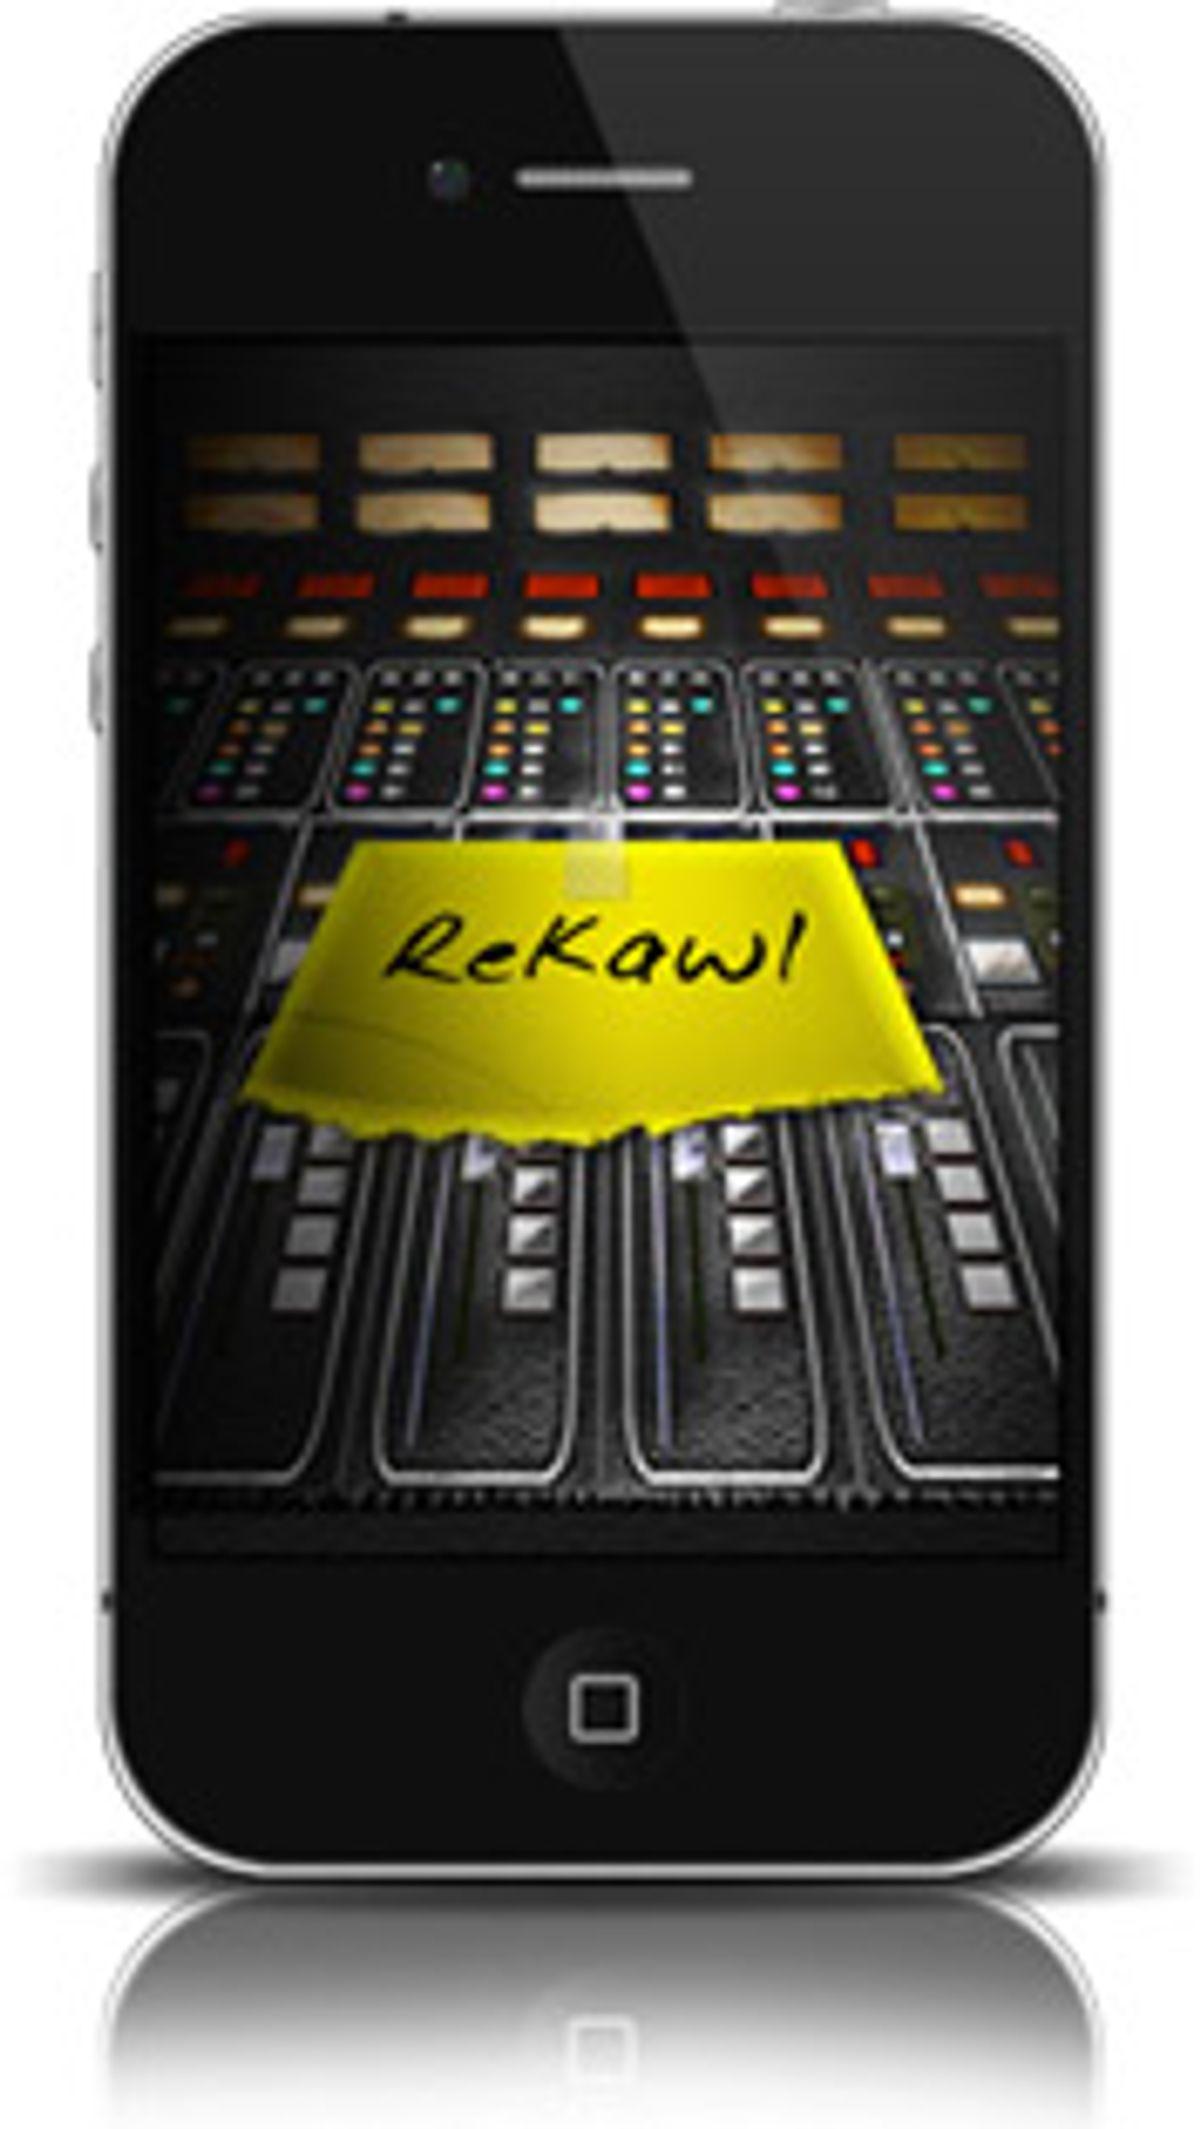 Sahe Audio Announces ReKawl iPhone App